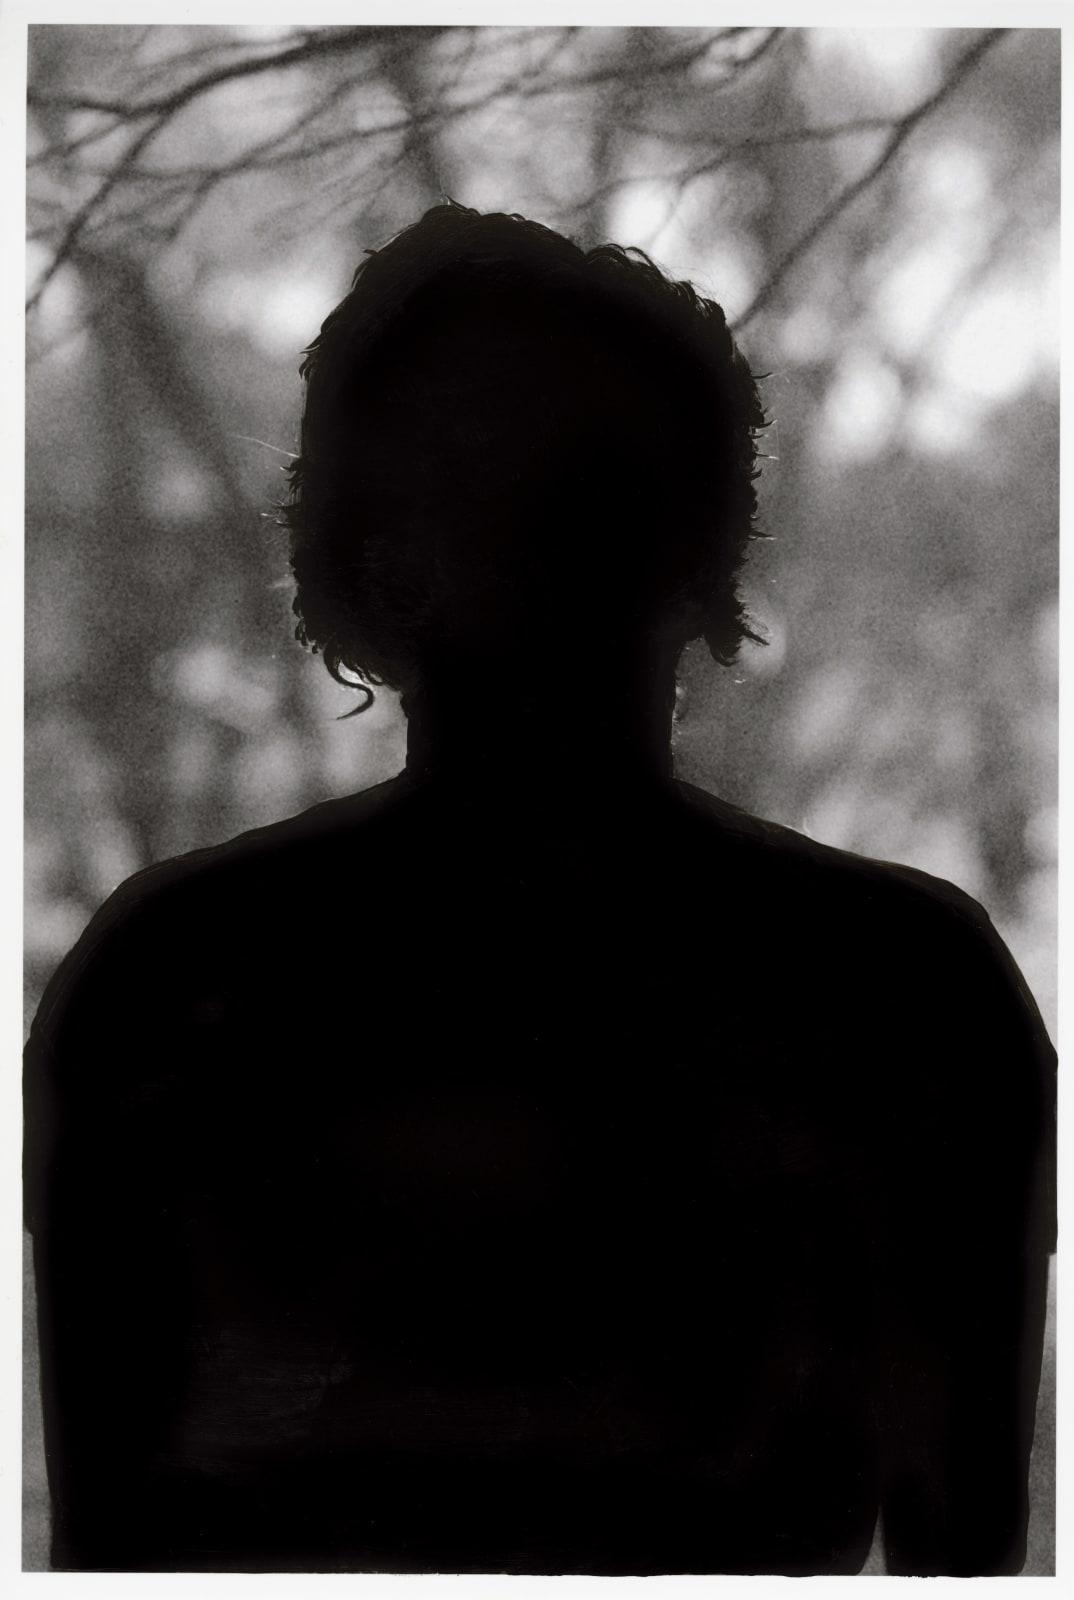 Patrick Waterhouse, Restricted Front Portrait, 2014 - 2018